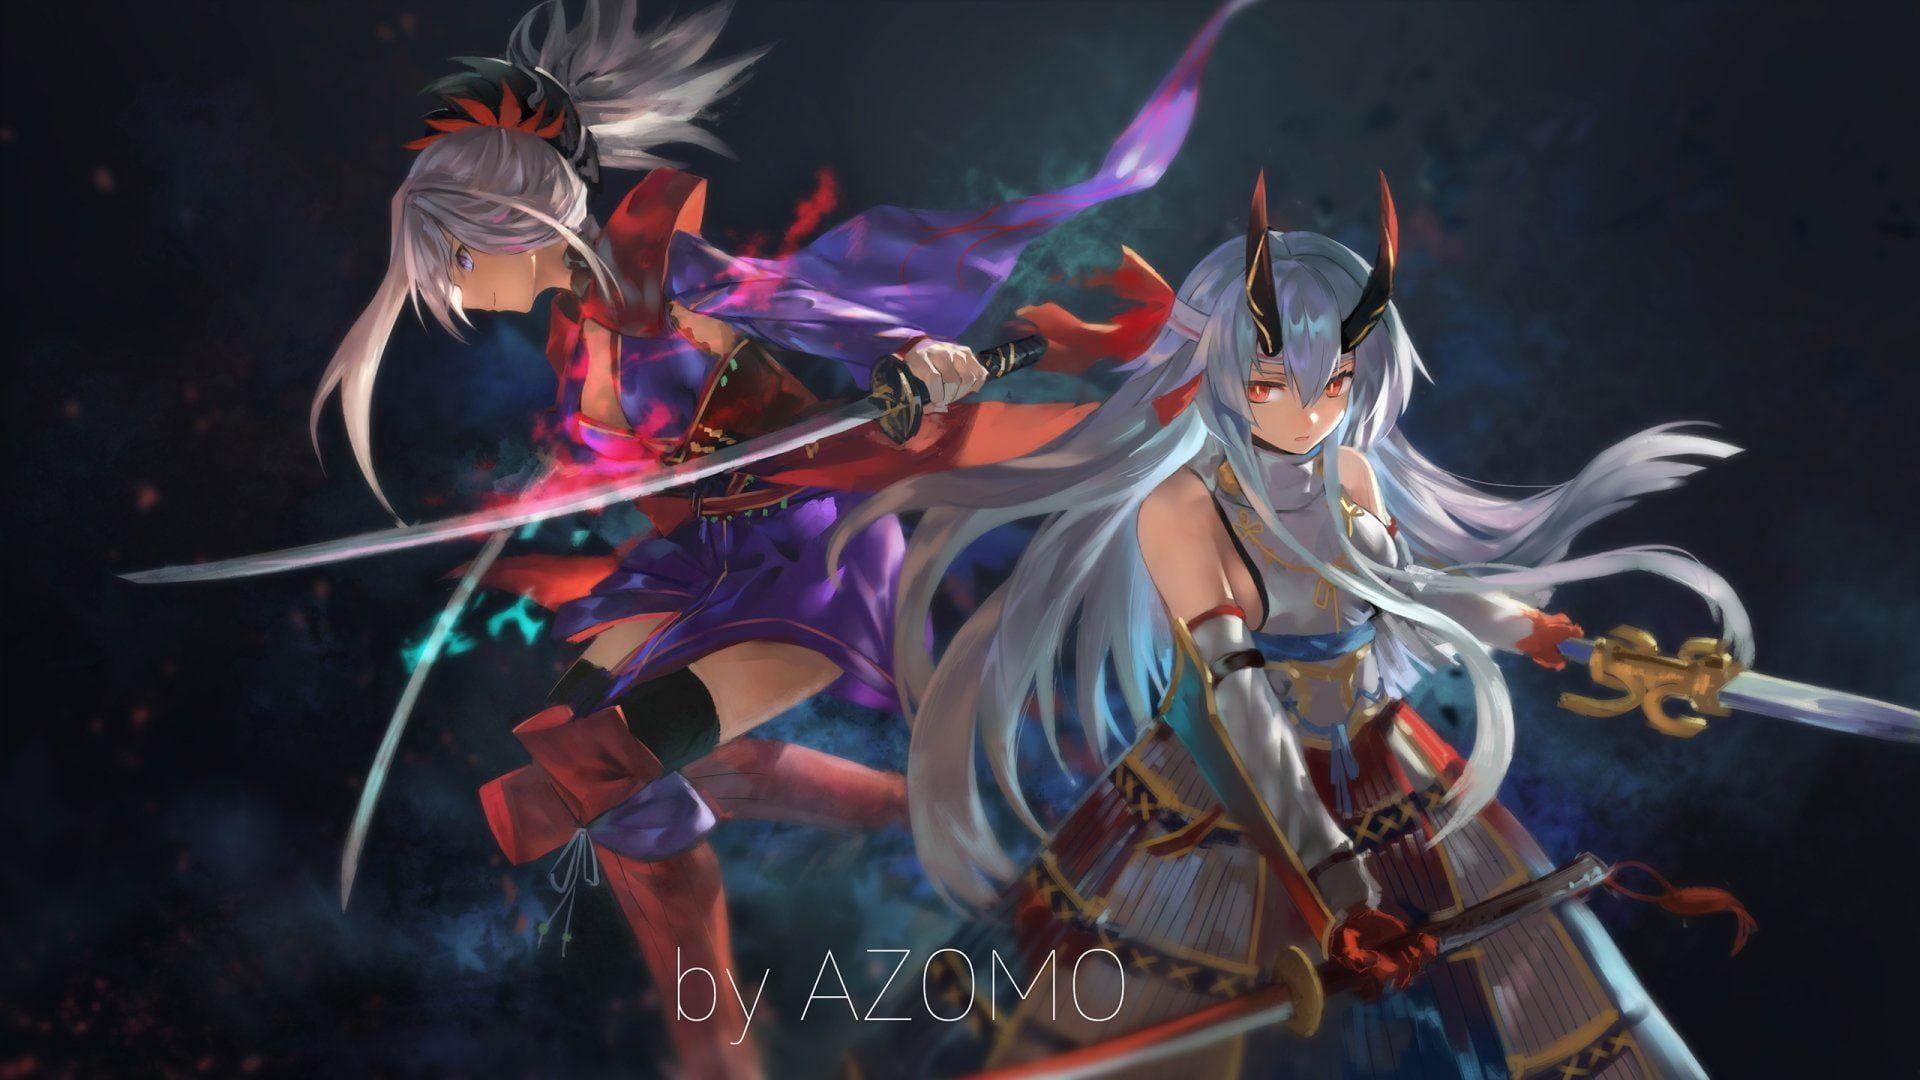 Fate Series Fate Grand Order Miyamoto Musashi Tomoe Gozen Fate Grand Order 1080p Wallpaper Hdwallpaper Desktop In 2020 Anime Miyamoto Musashi Anime Wallpaper